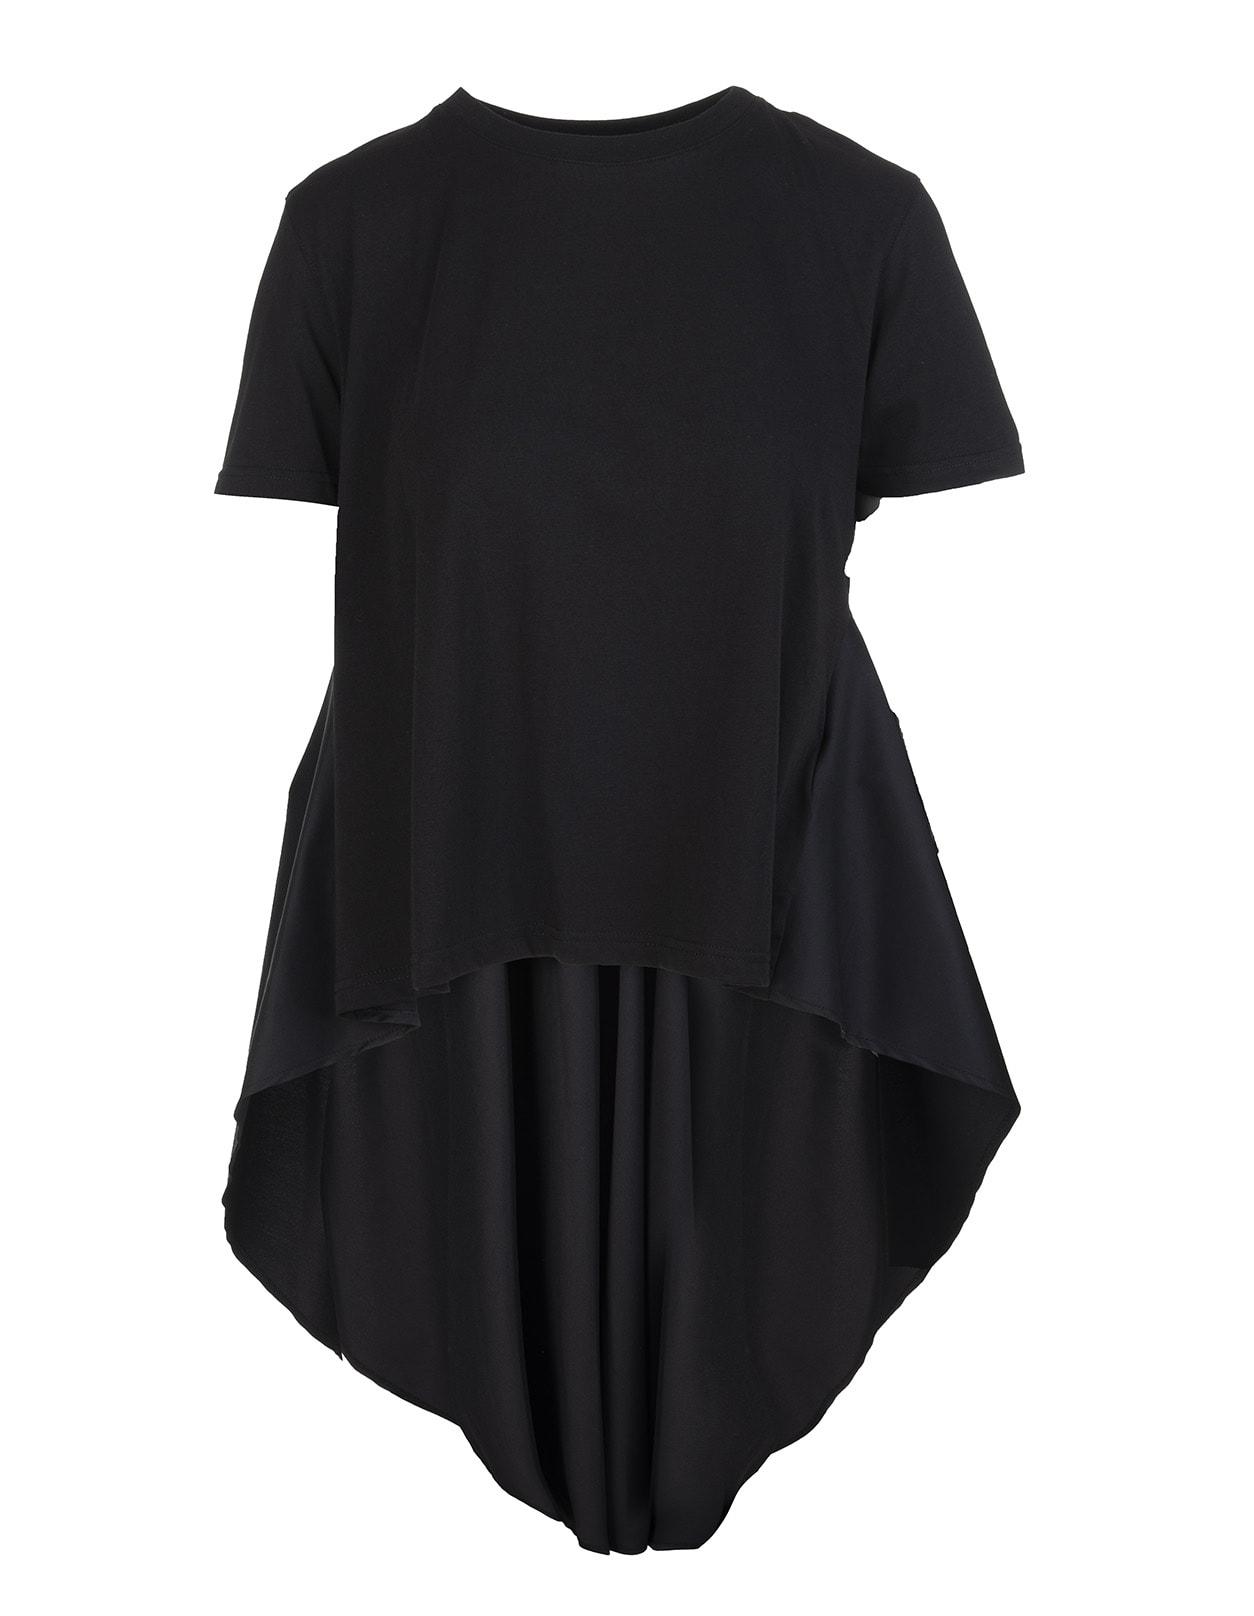 Red Valentino T-shirts BLACK THE BLACK TAG WOMAN T-SHIRT